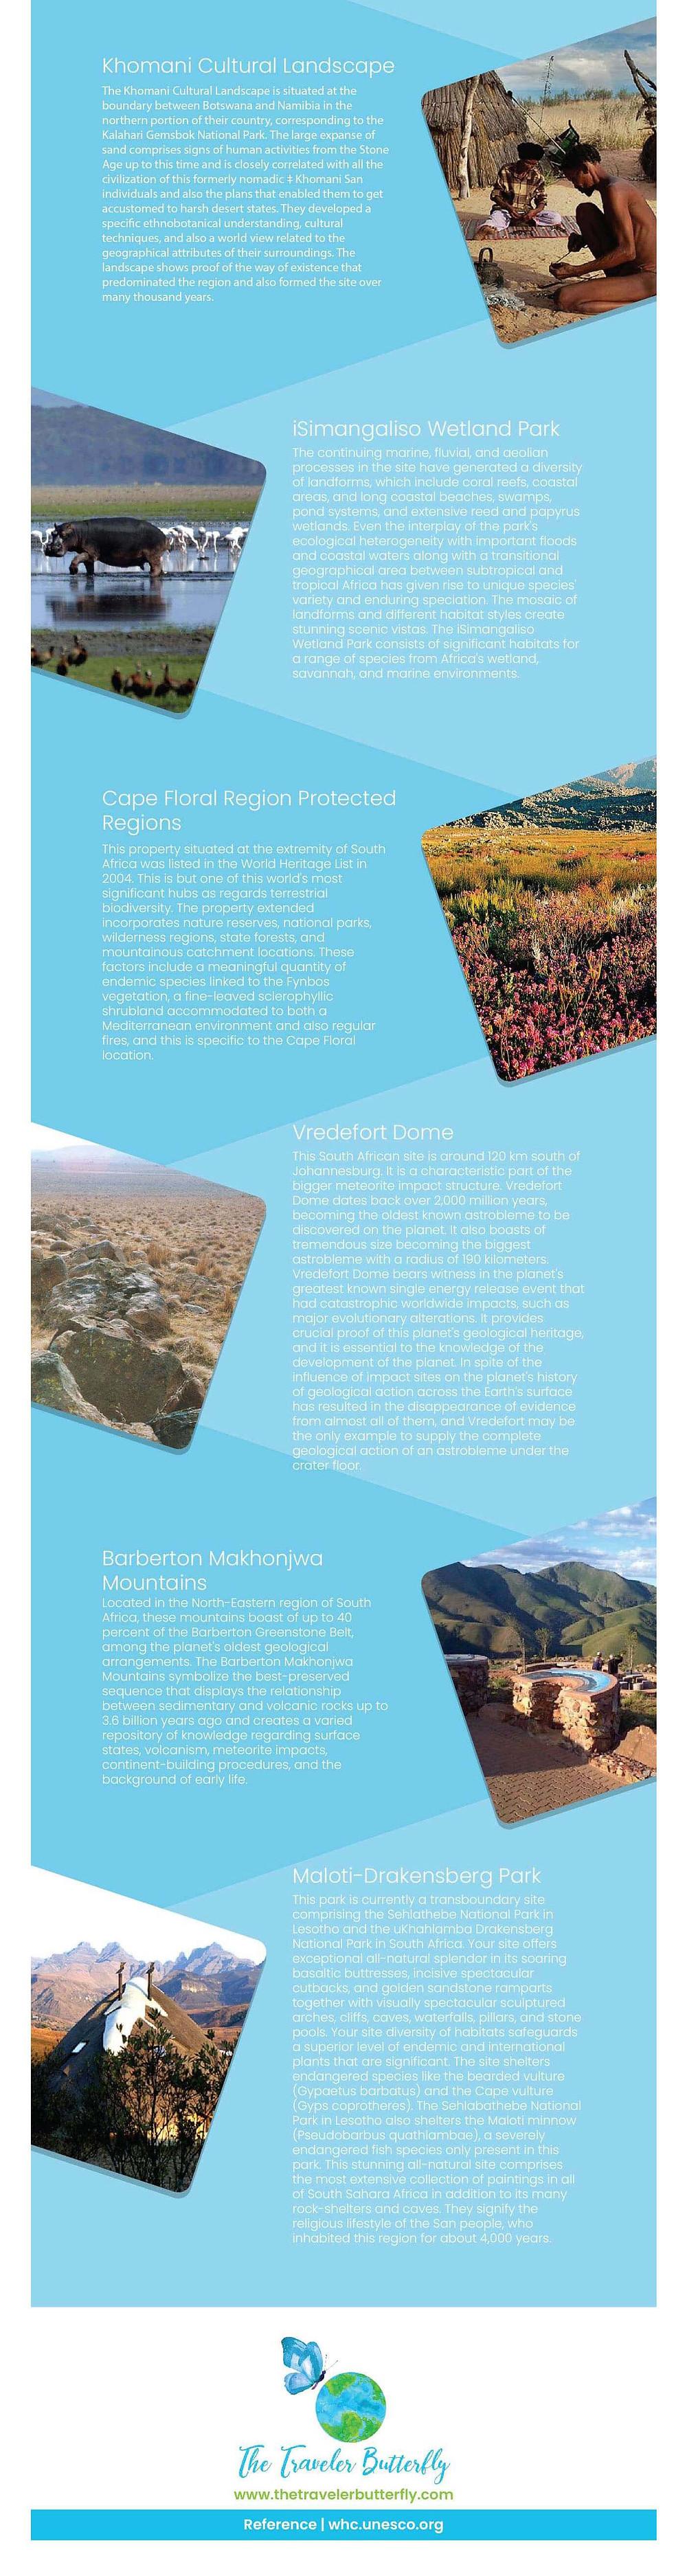 Khomani cultural landscape